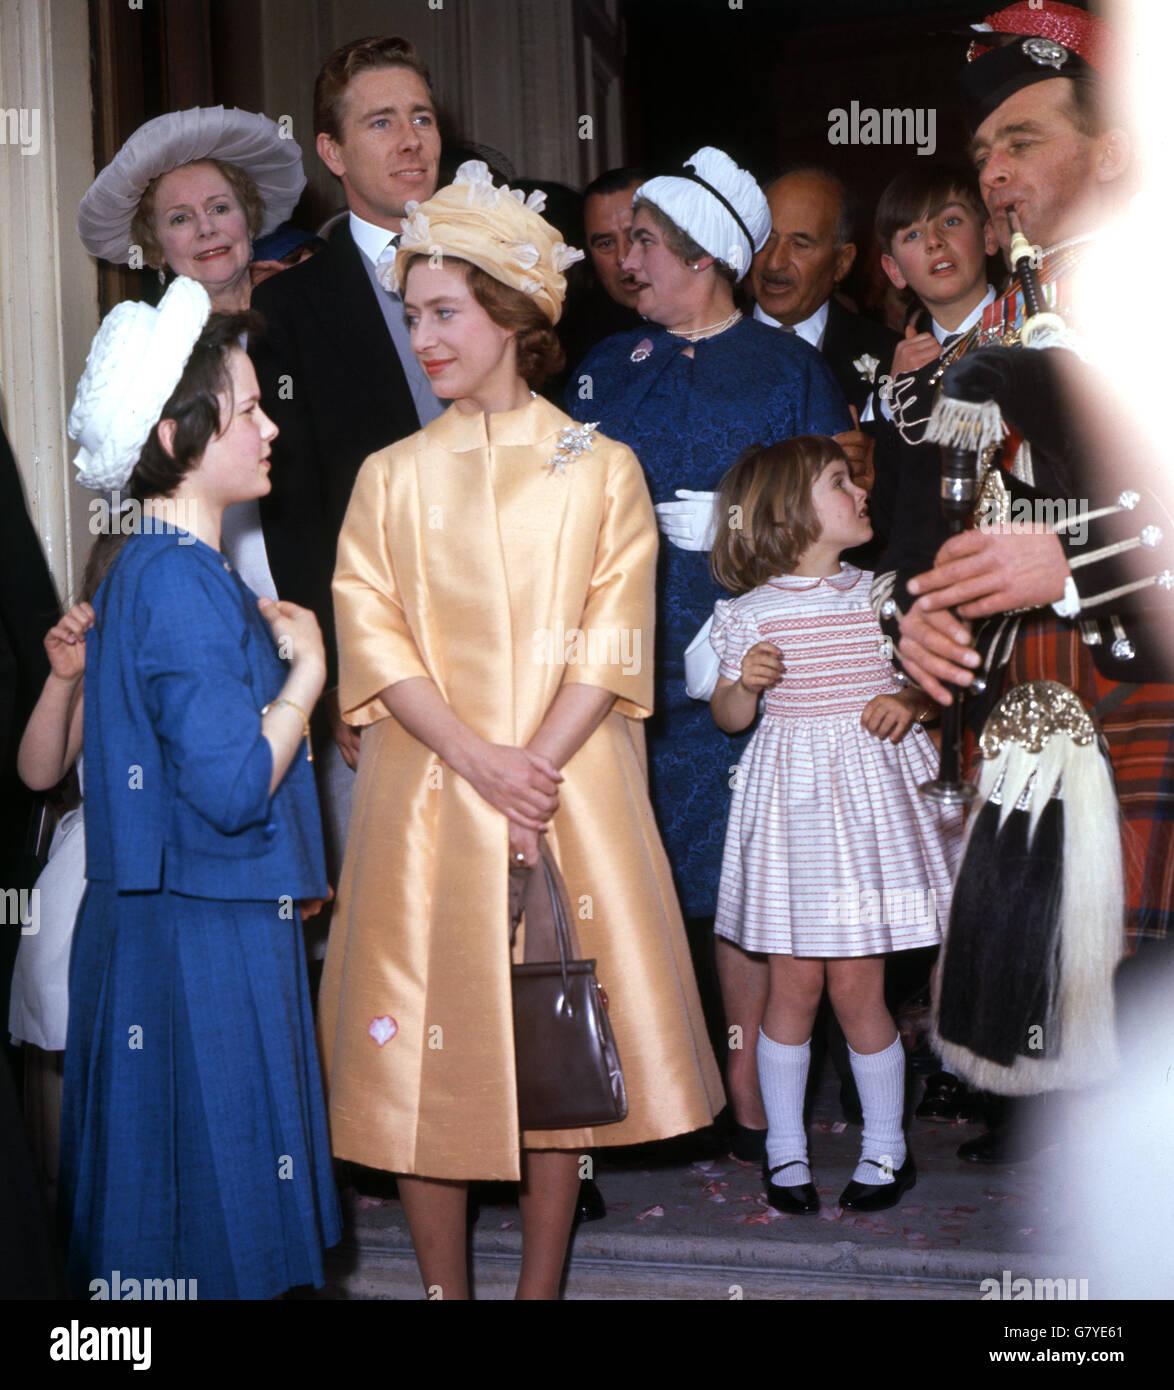 Princess Margaret Wedding.Royalty Princess Margaret Wedding Of Countess Bunny Esteslazy